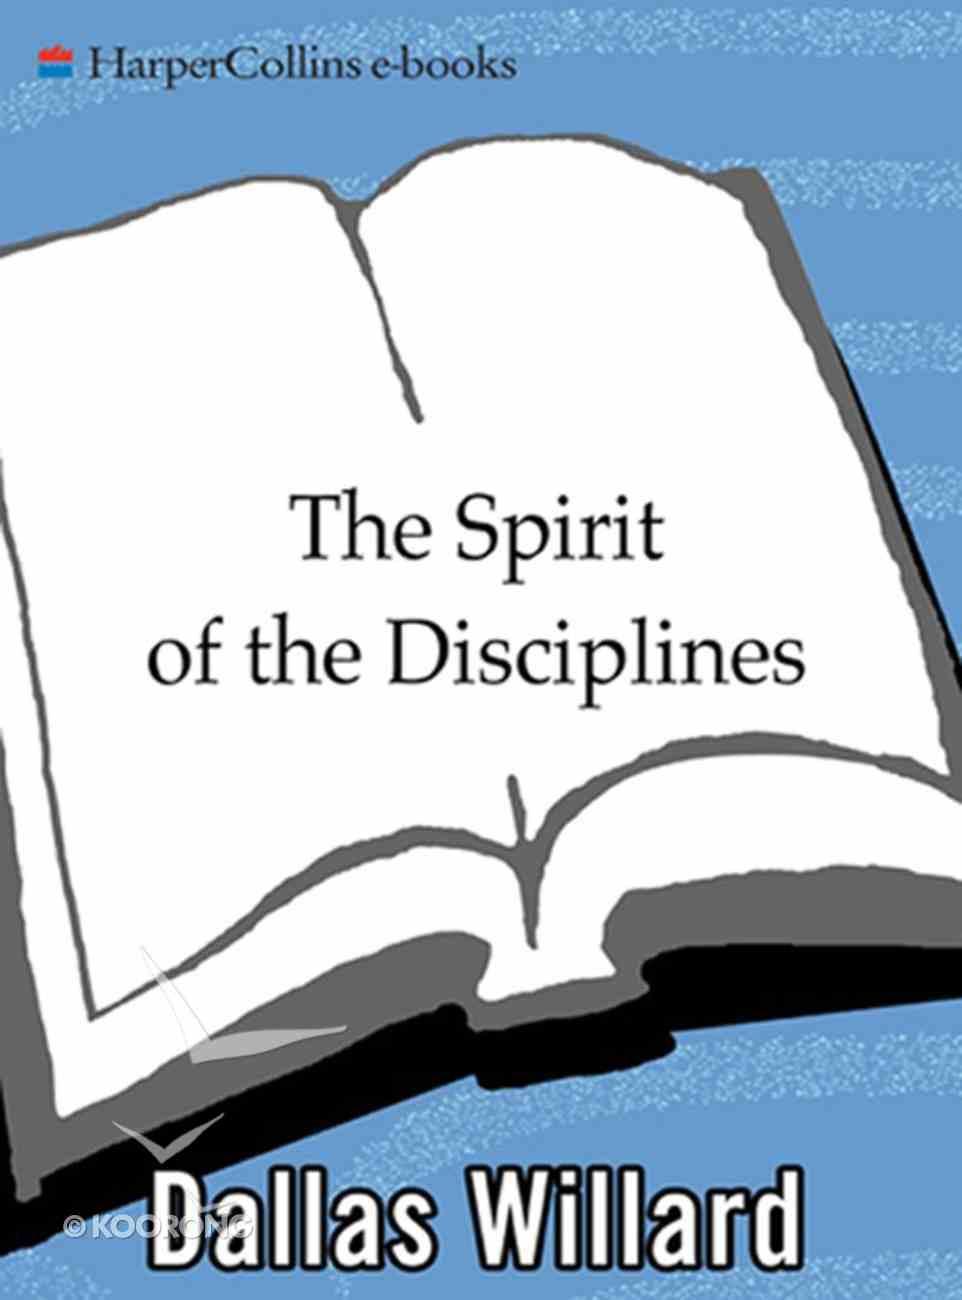 The Spirit of the Disciplines eBook